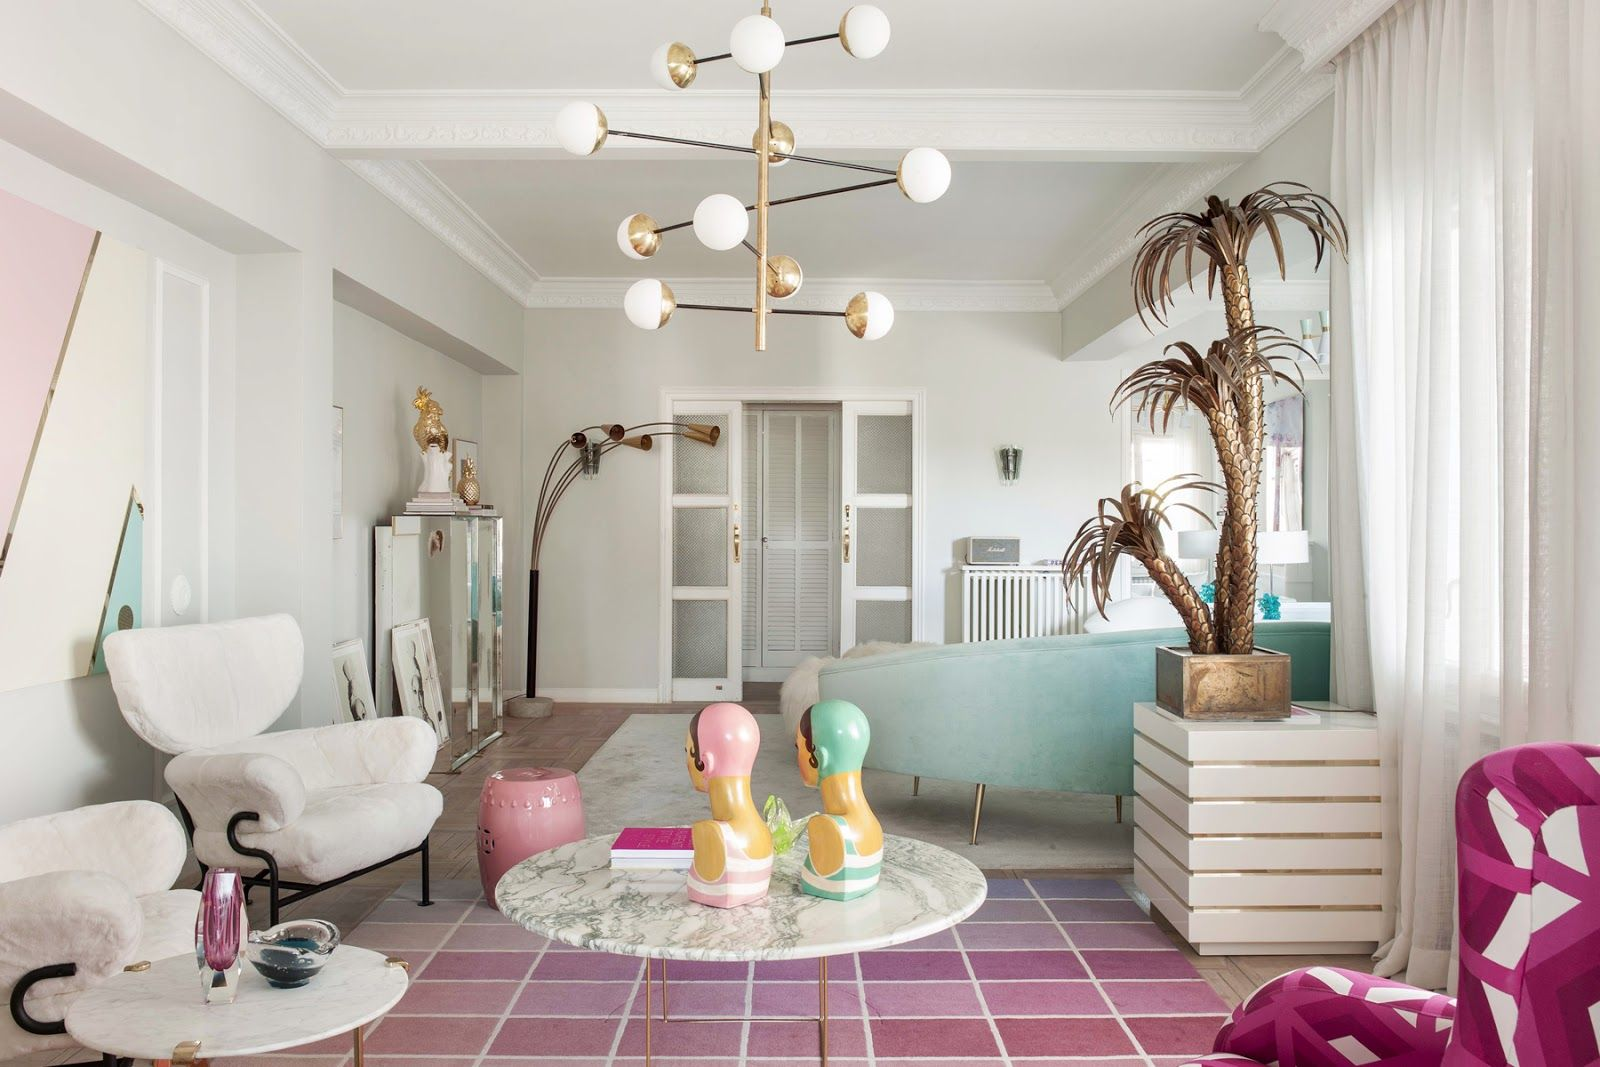 Contemporary interior modern design room living also pin by valeria belyaeva on maximalism in decor rh pinterest